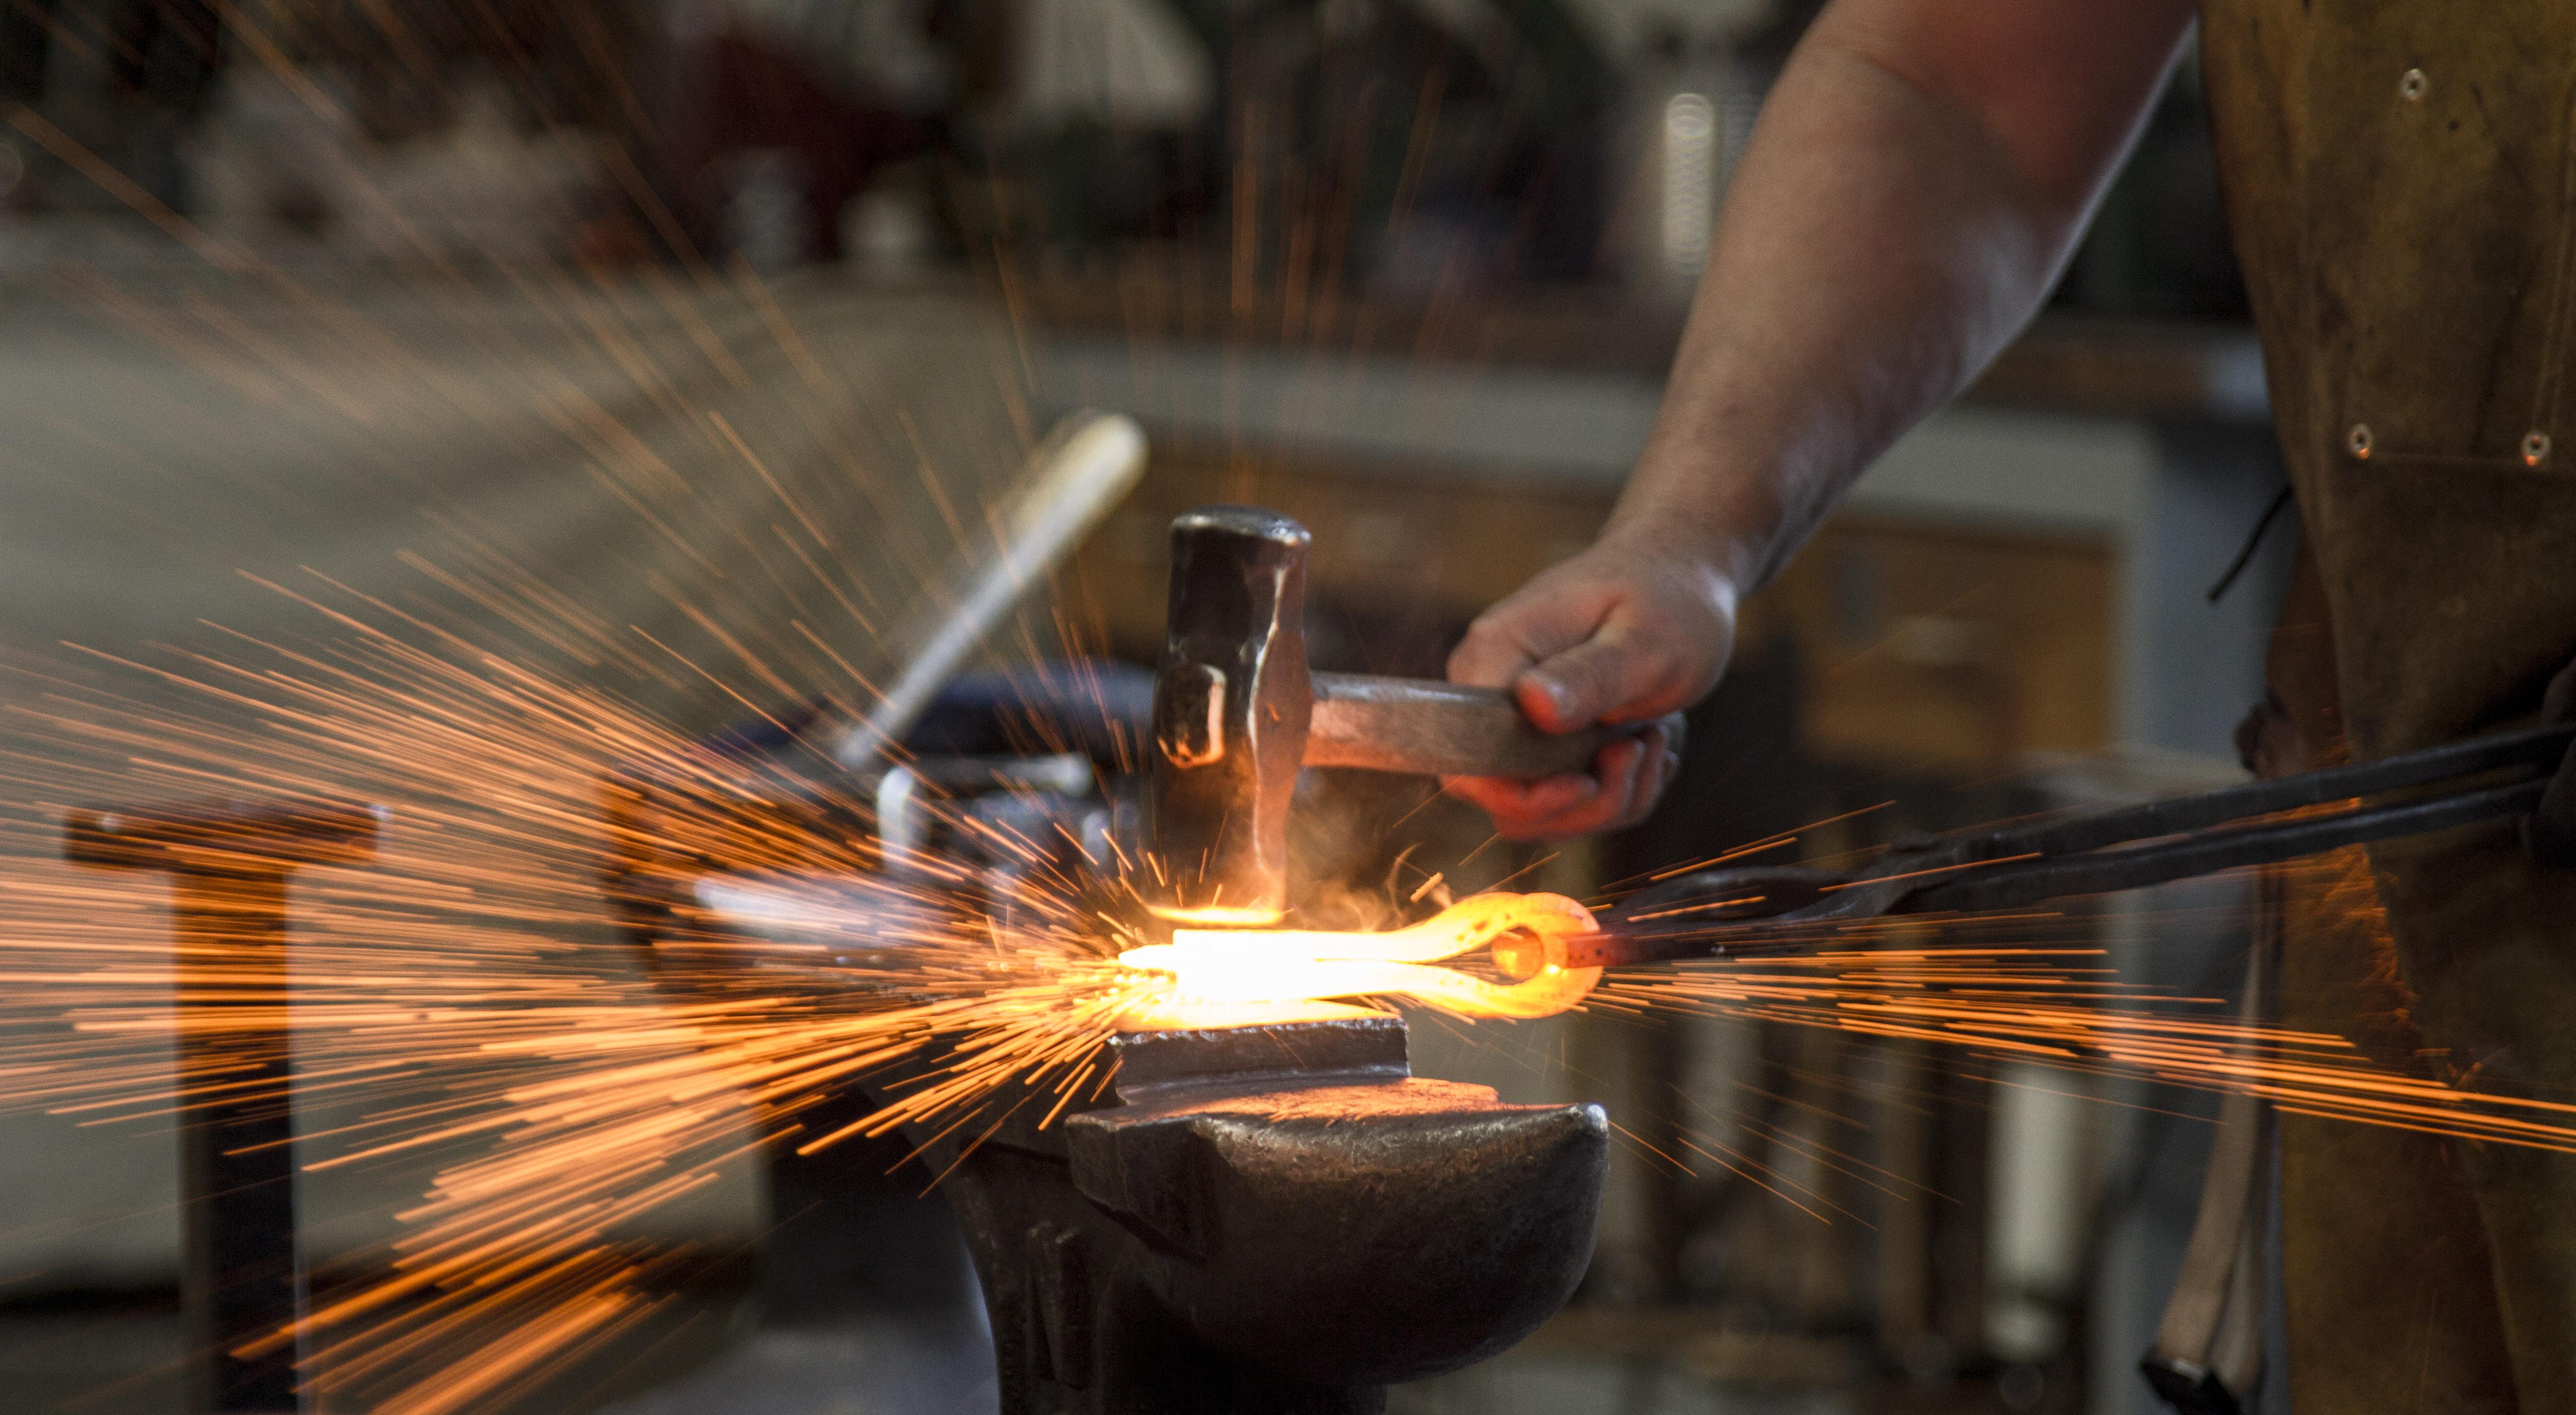 Forge welding my first axe head - Axes, Hatchets, Hawks ...